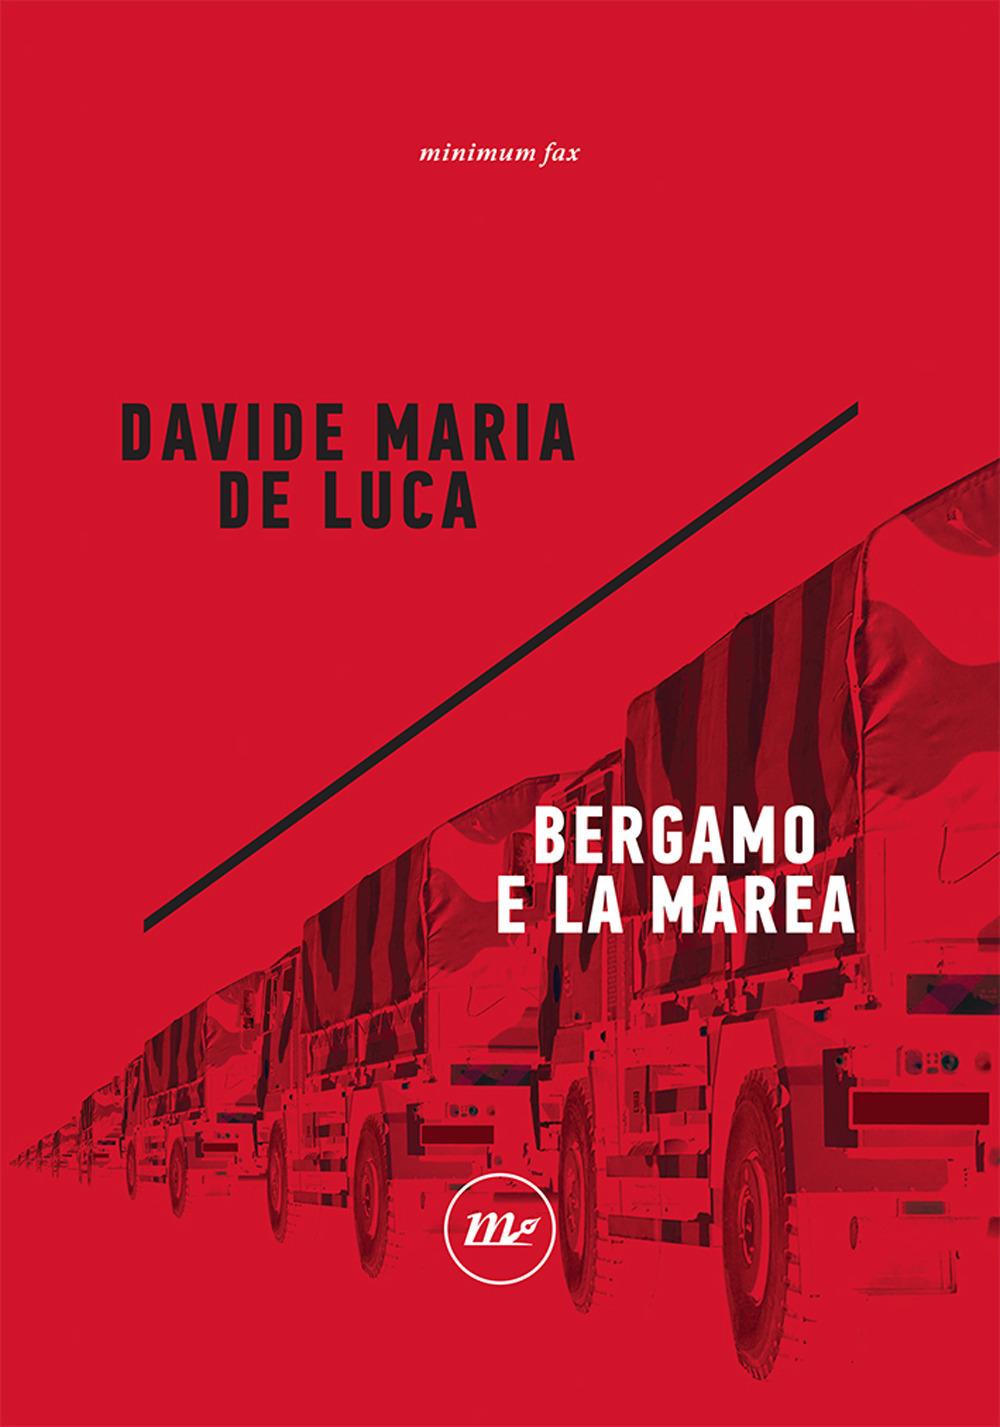 BERGAMO E LA MAREA - De Luca Davide Maria - 9788833892023